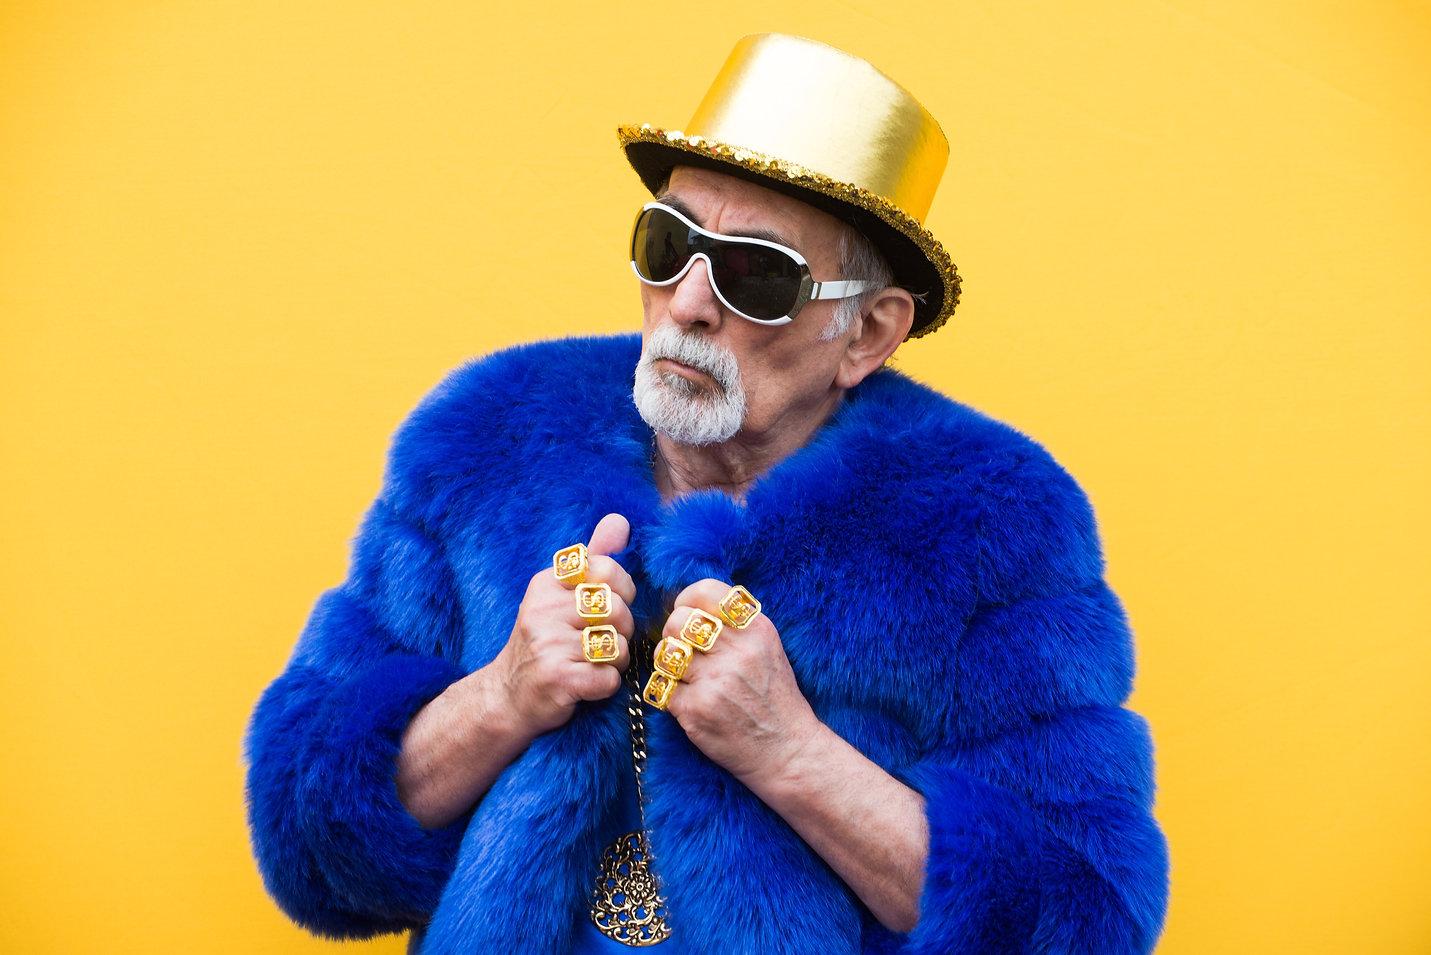 Funny and extravagant senior man posing